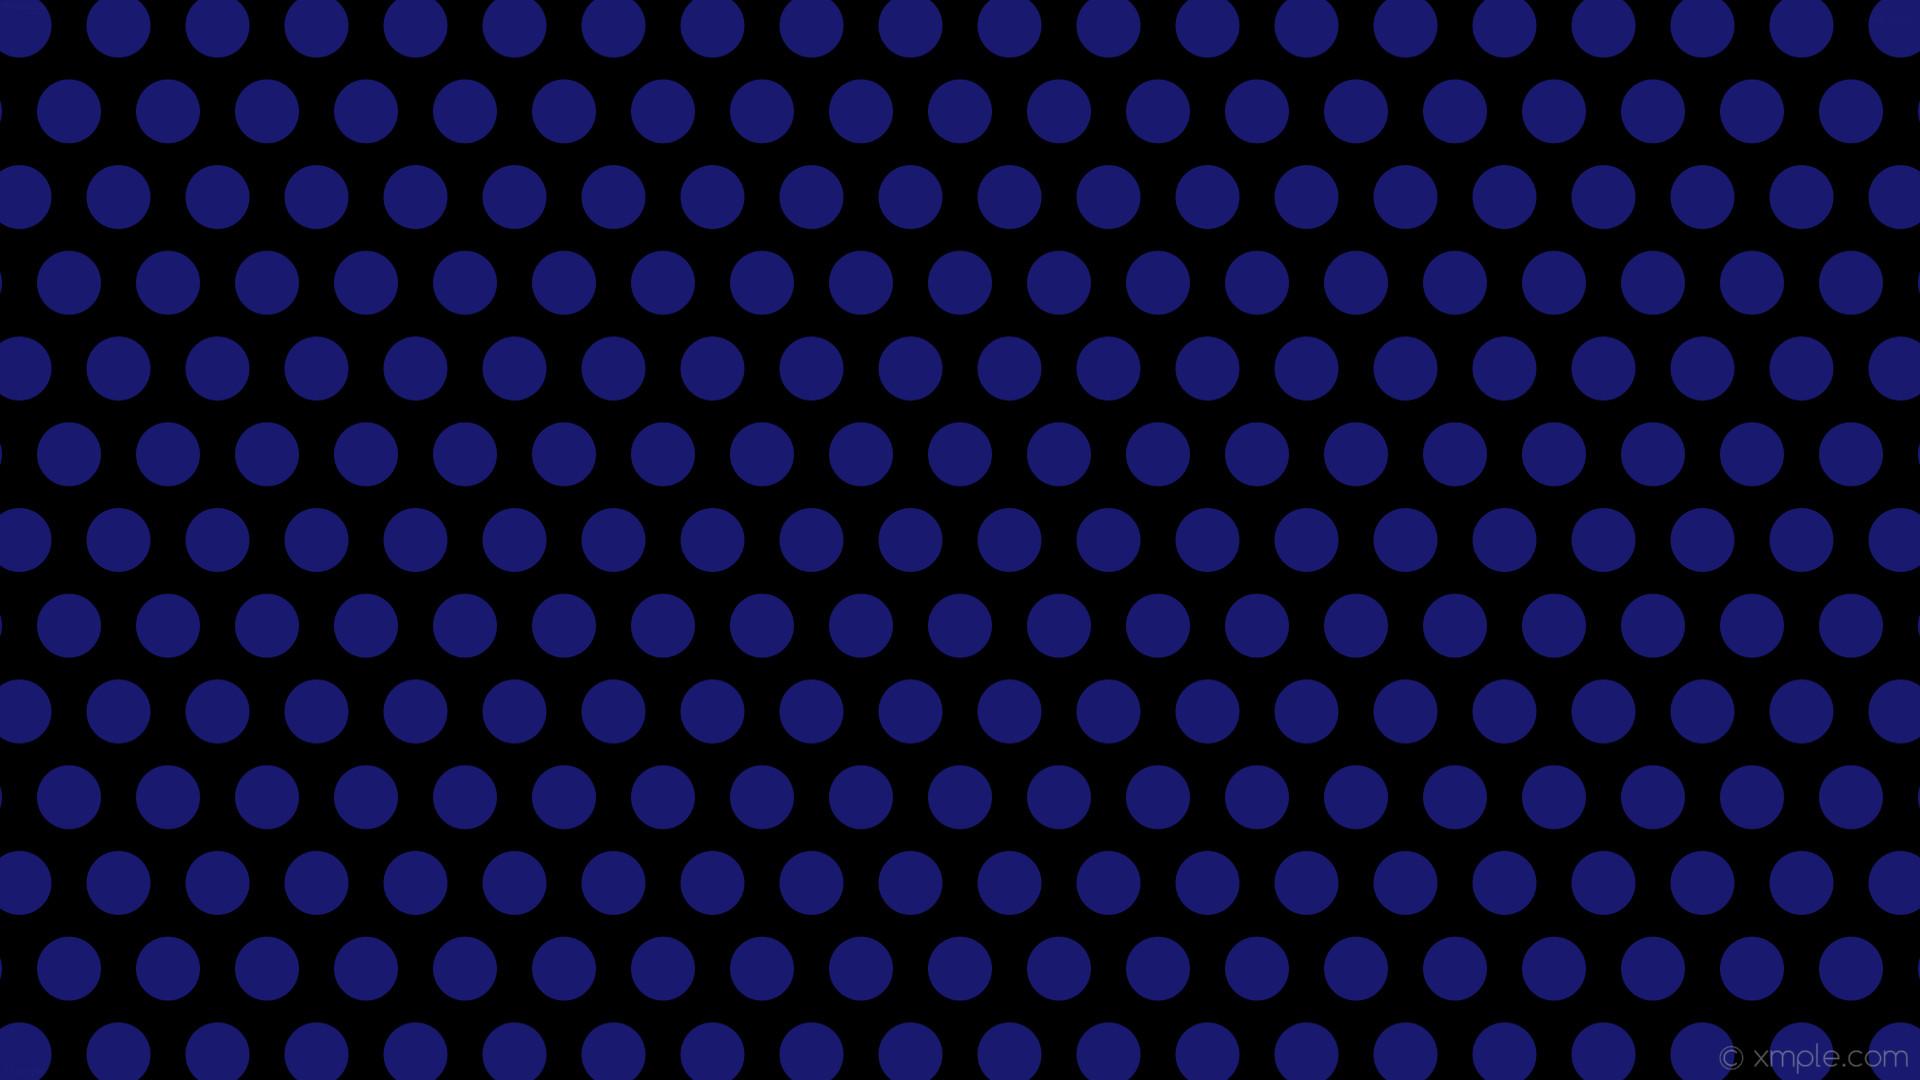 wallpaper dots black hexagon blue polka midnight blue #000000 #191970 0°  64px 99px